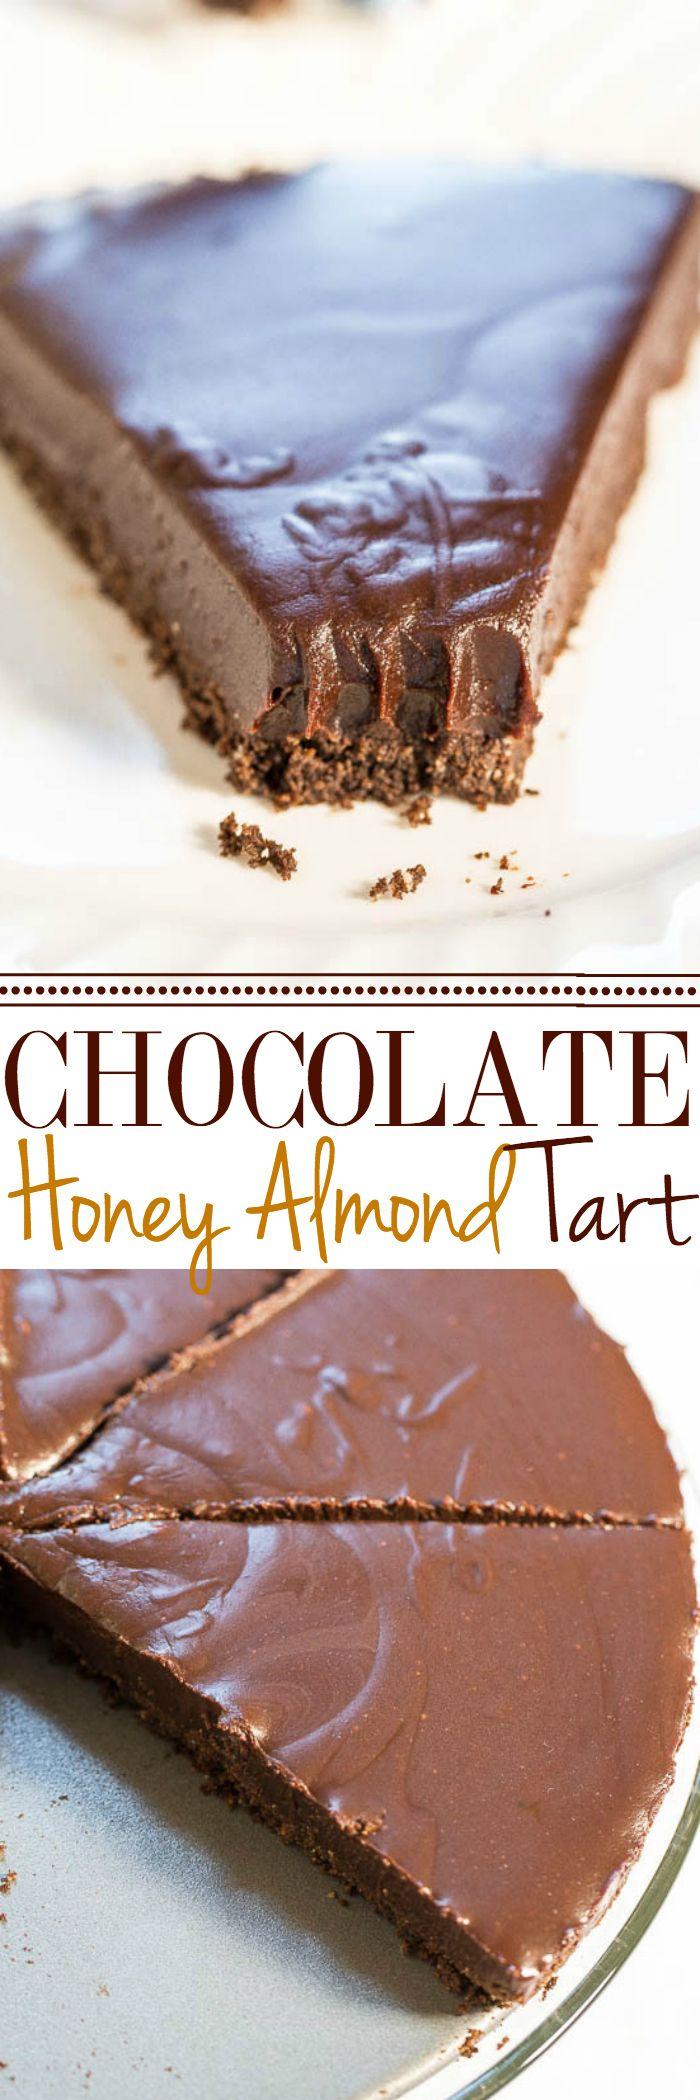 Chocolate Honey Almond Tart | Recipe | Almond recipes, Chocolate tarts ...